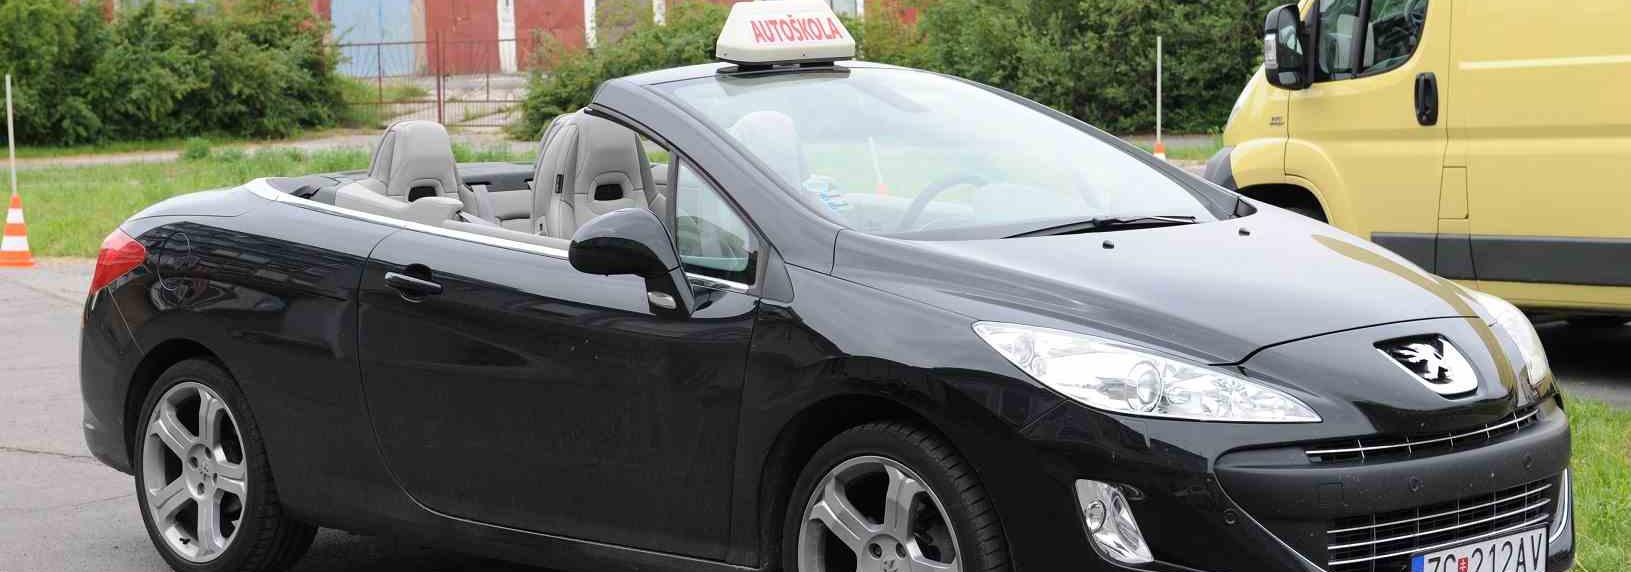 Autoškola TABO - správna cesta k vášmu vodičskému preukazu.